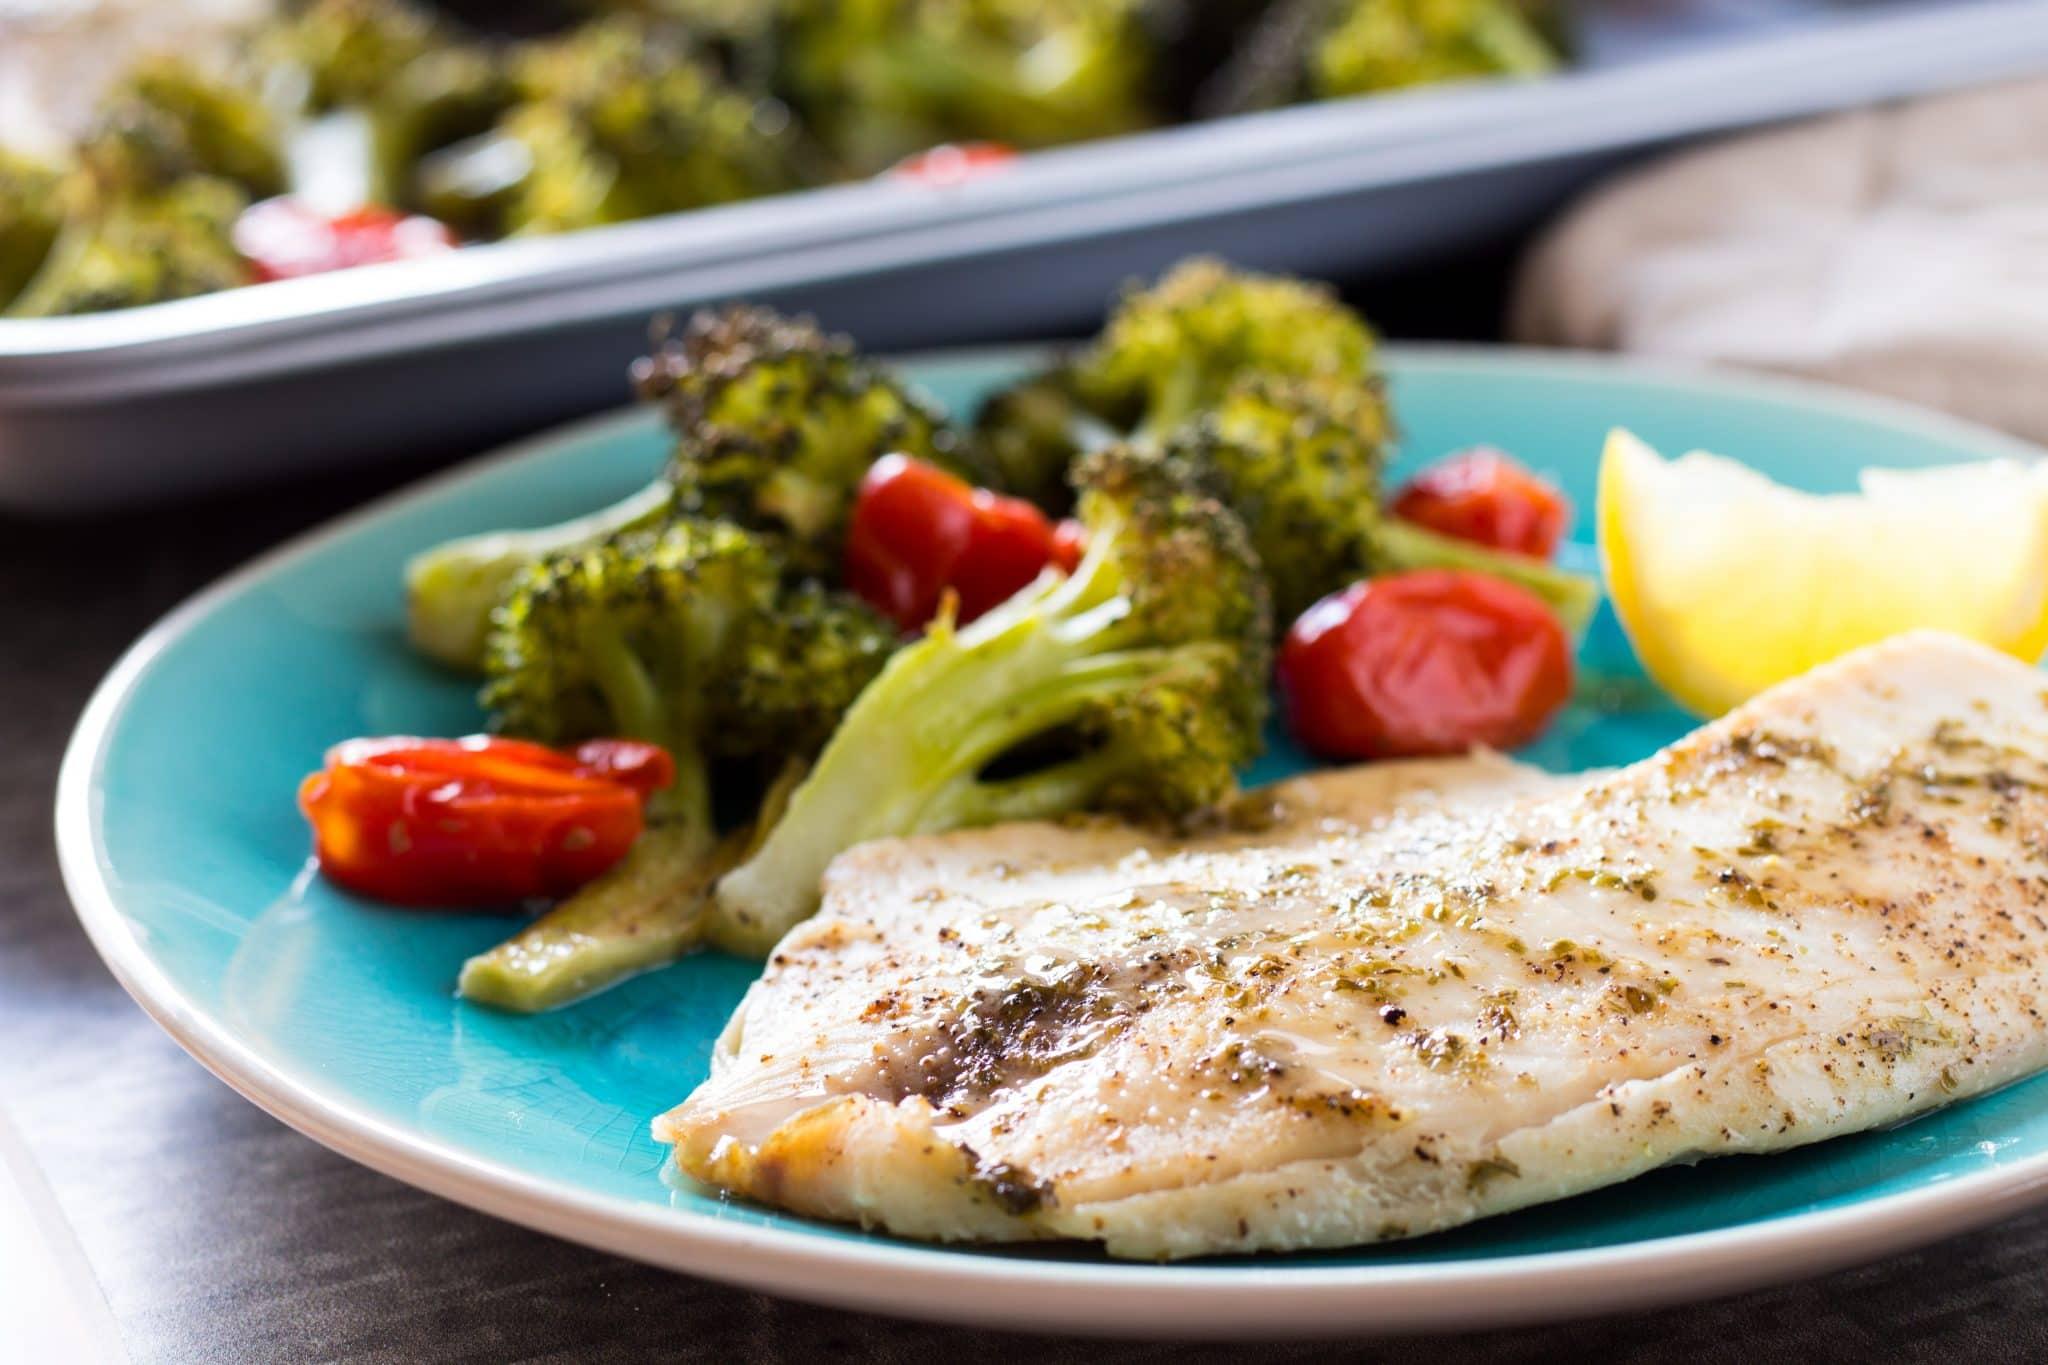 Roasted Tilapia and Broccoli Sheet Pan Dinner